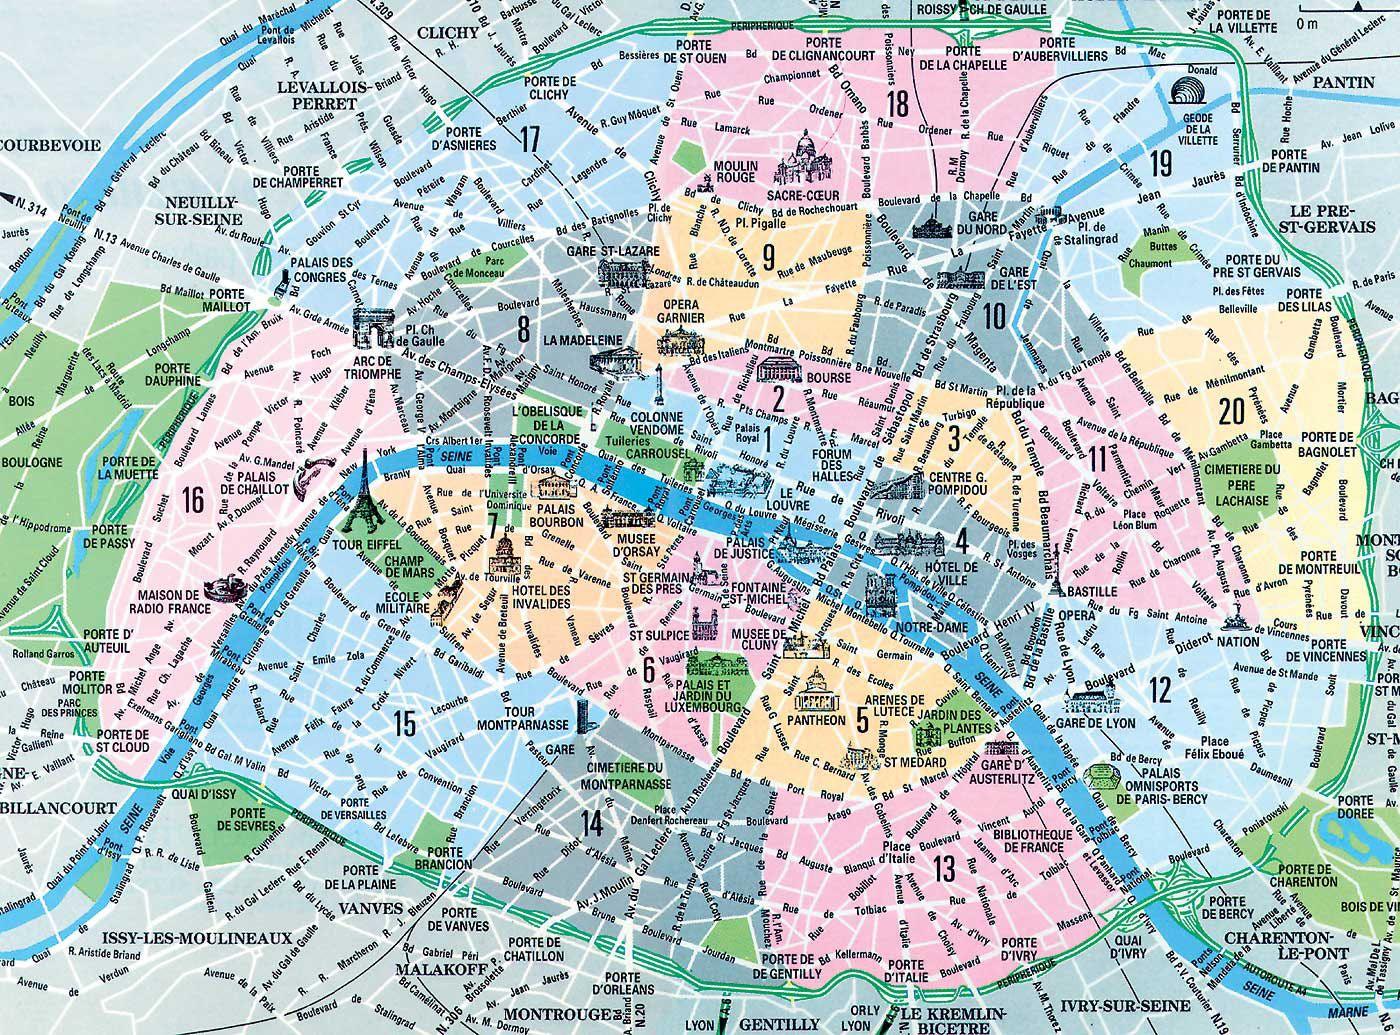 Map Of Paris Yahoo Image Search Results P A R I S - Paris mapa